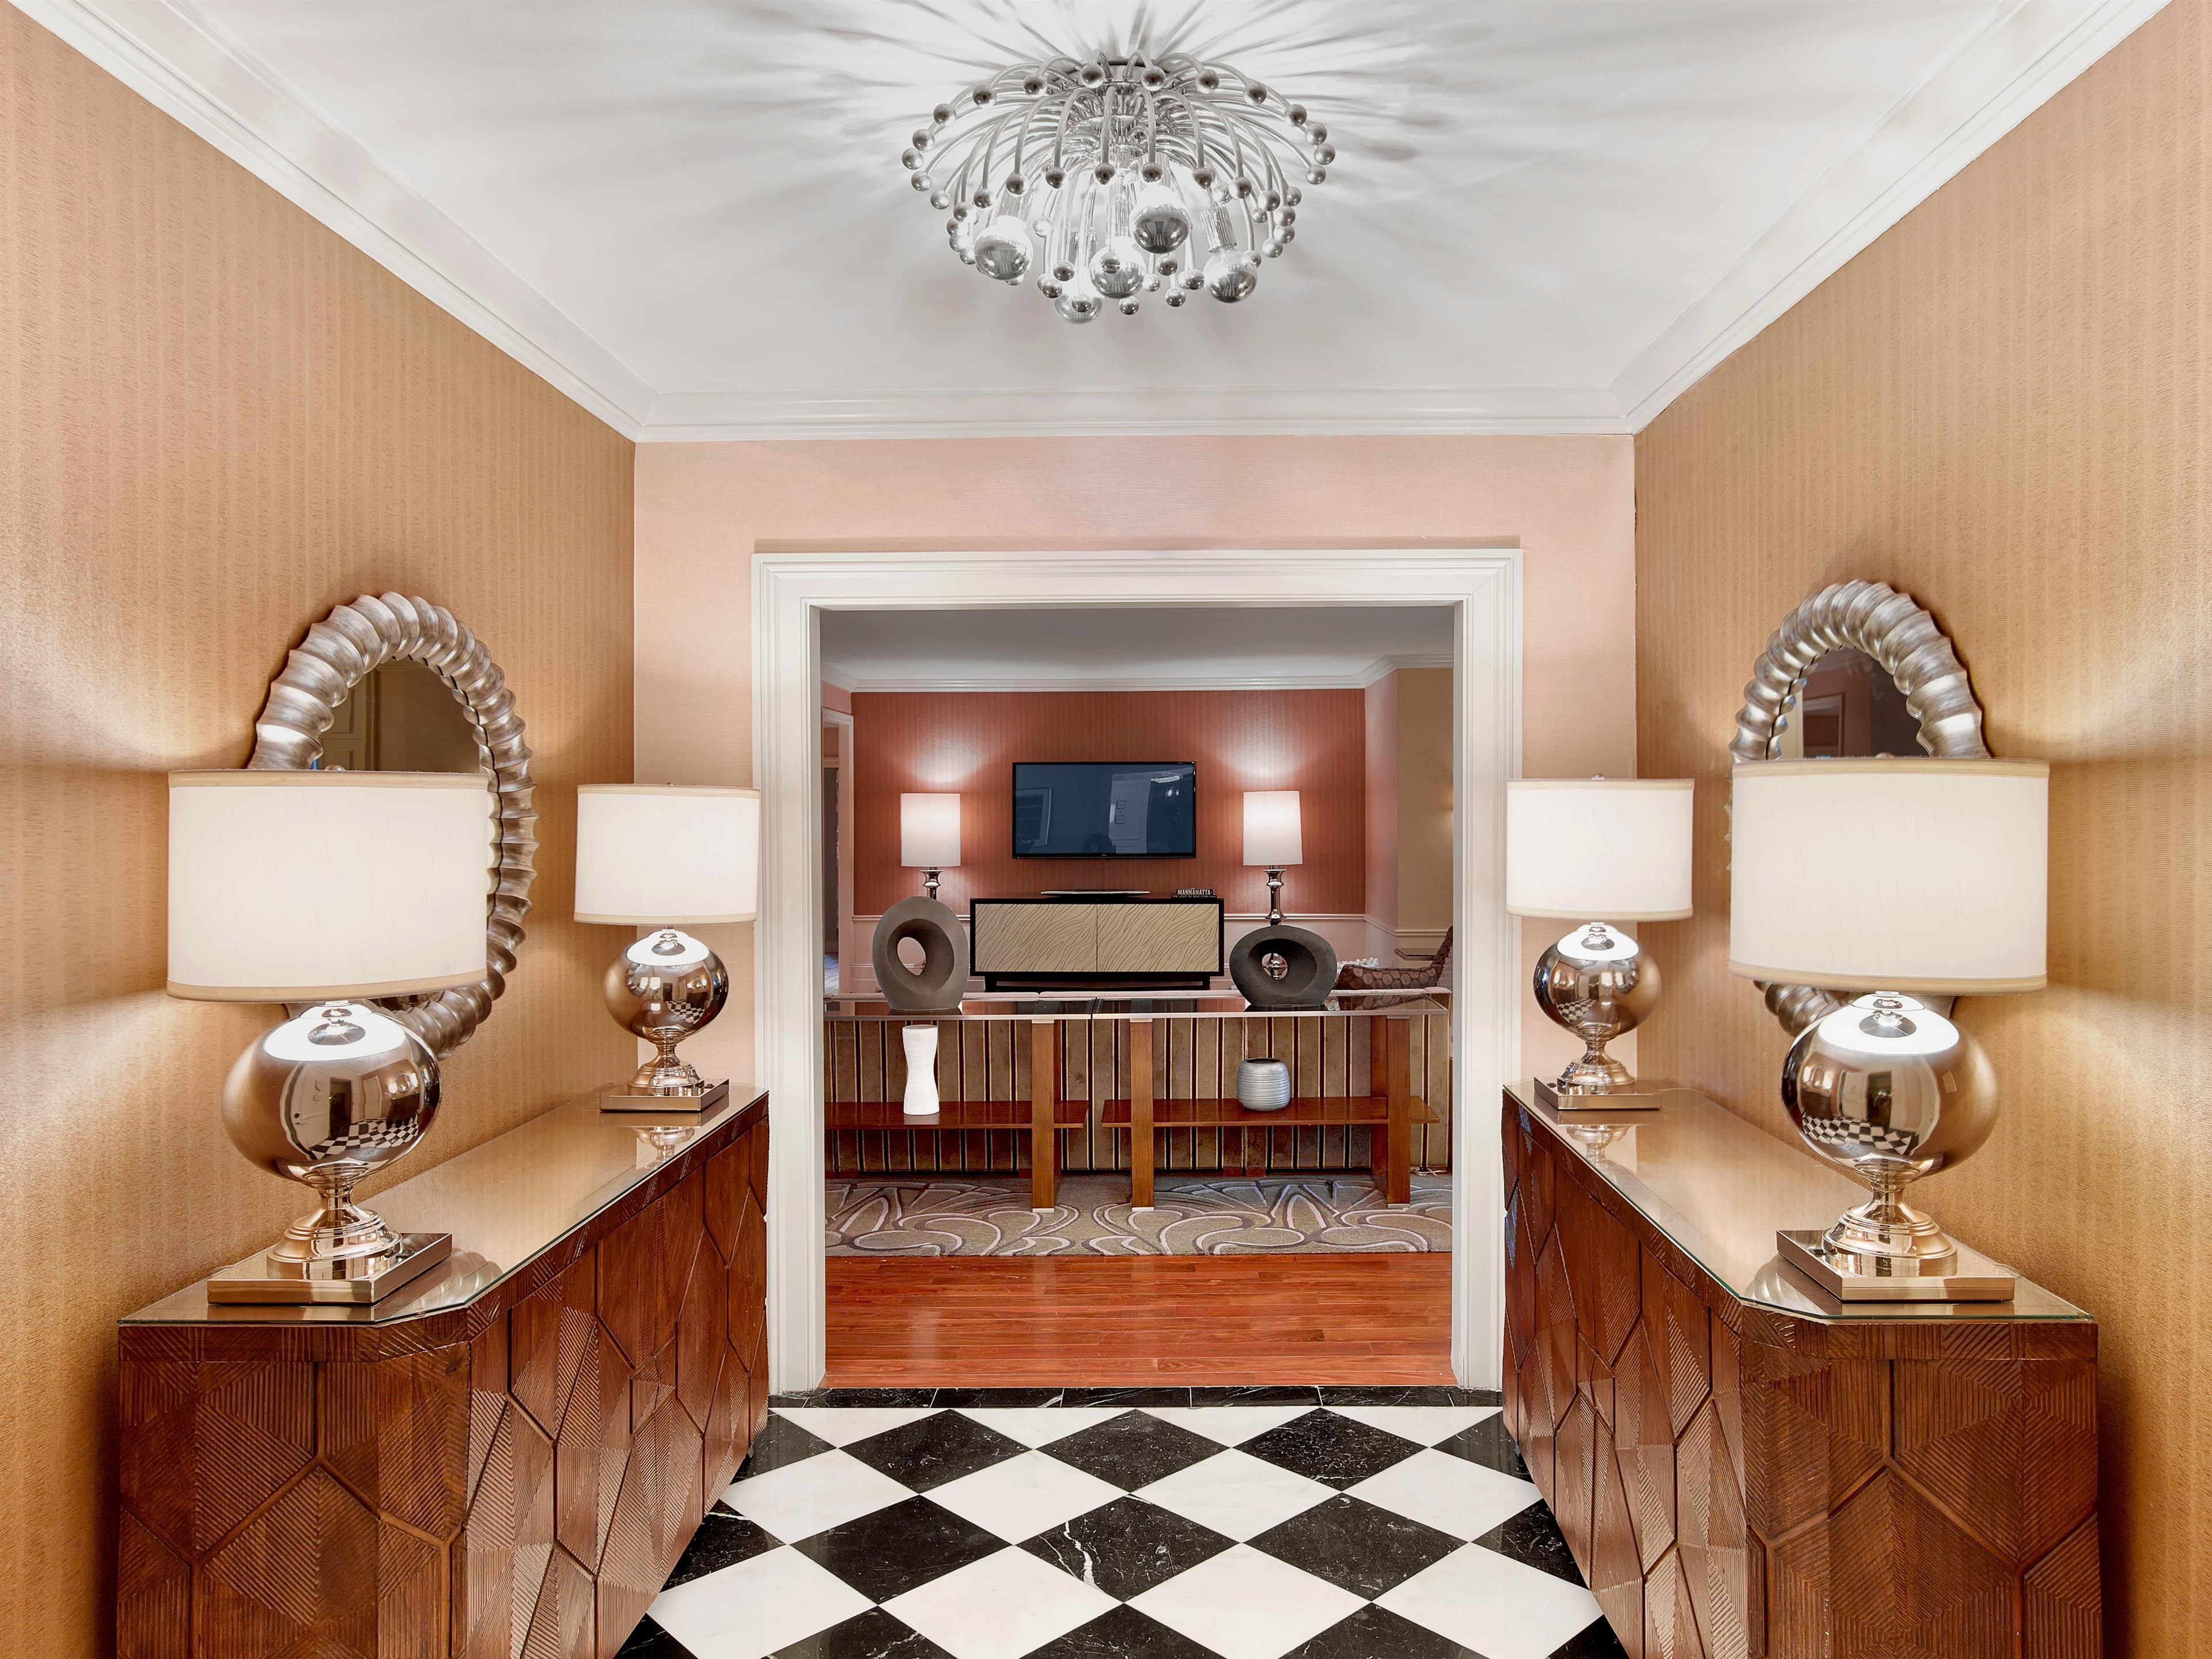 Sheraton New York Times Square Hotel image 47